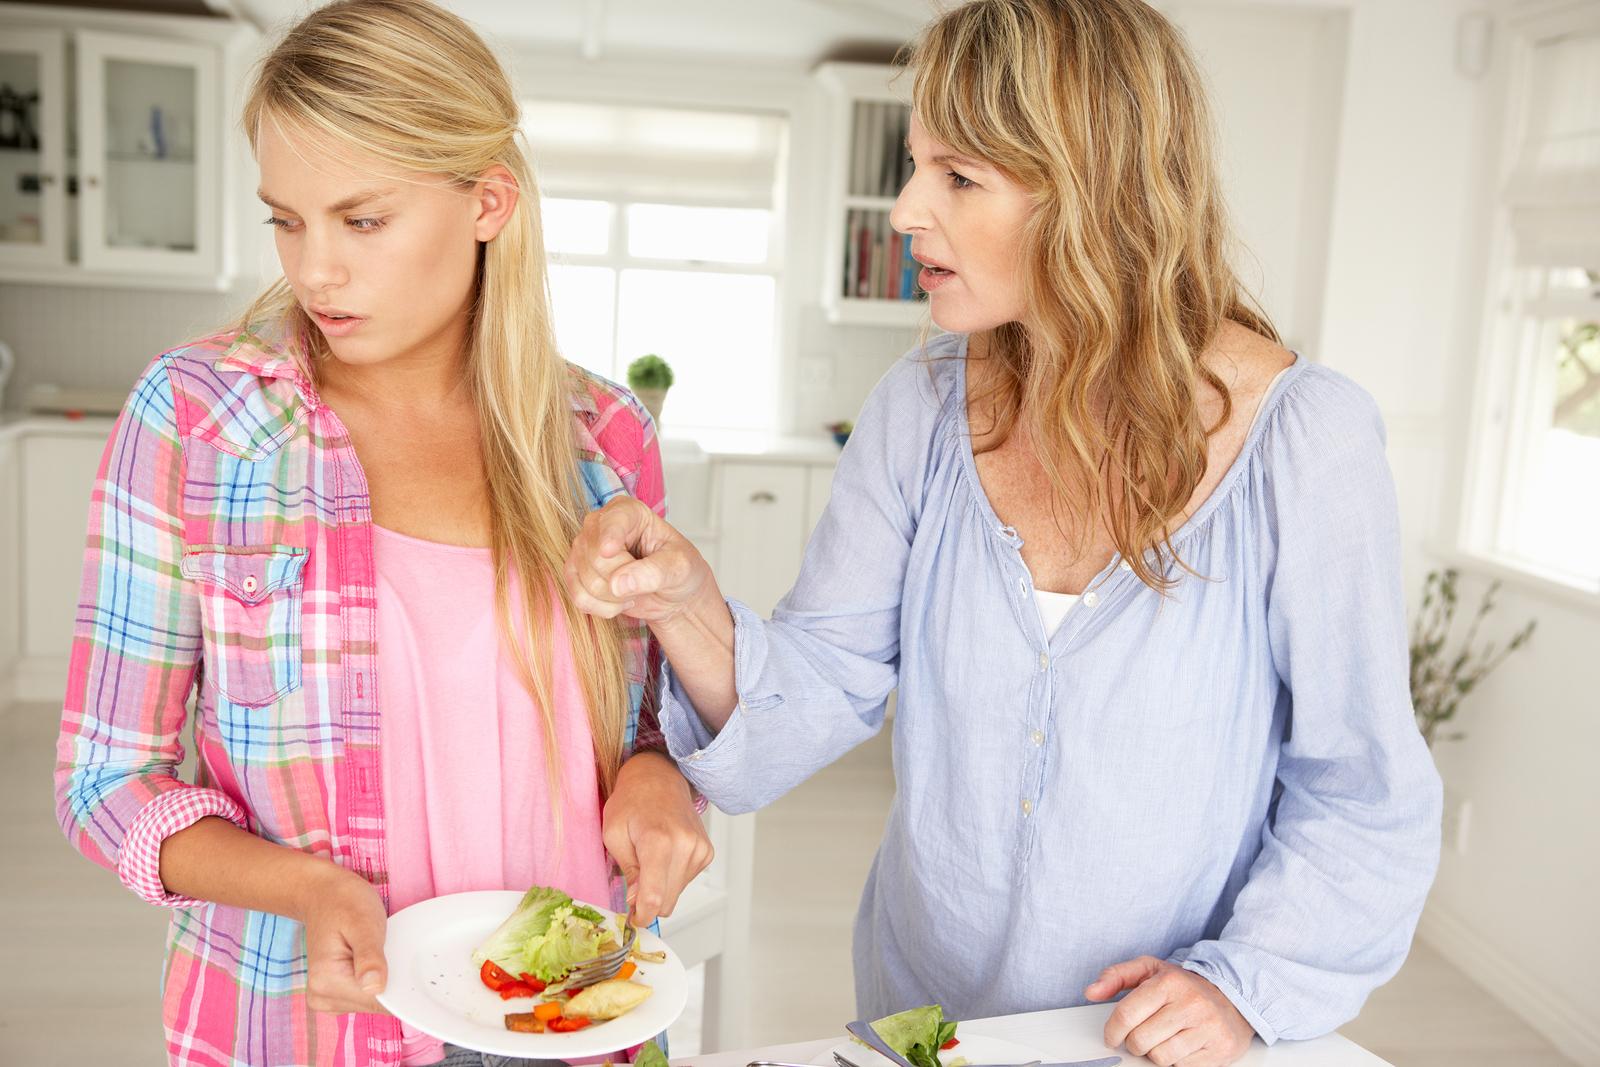 bigstock-Mother-and-teenage-daughter-ar-23247470.jpg